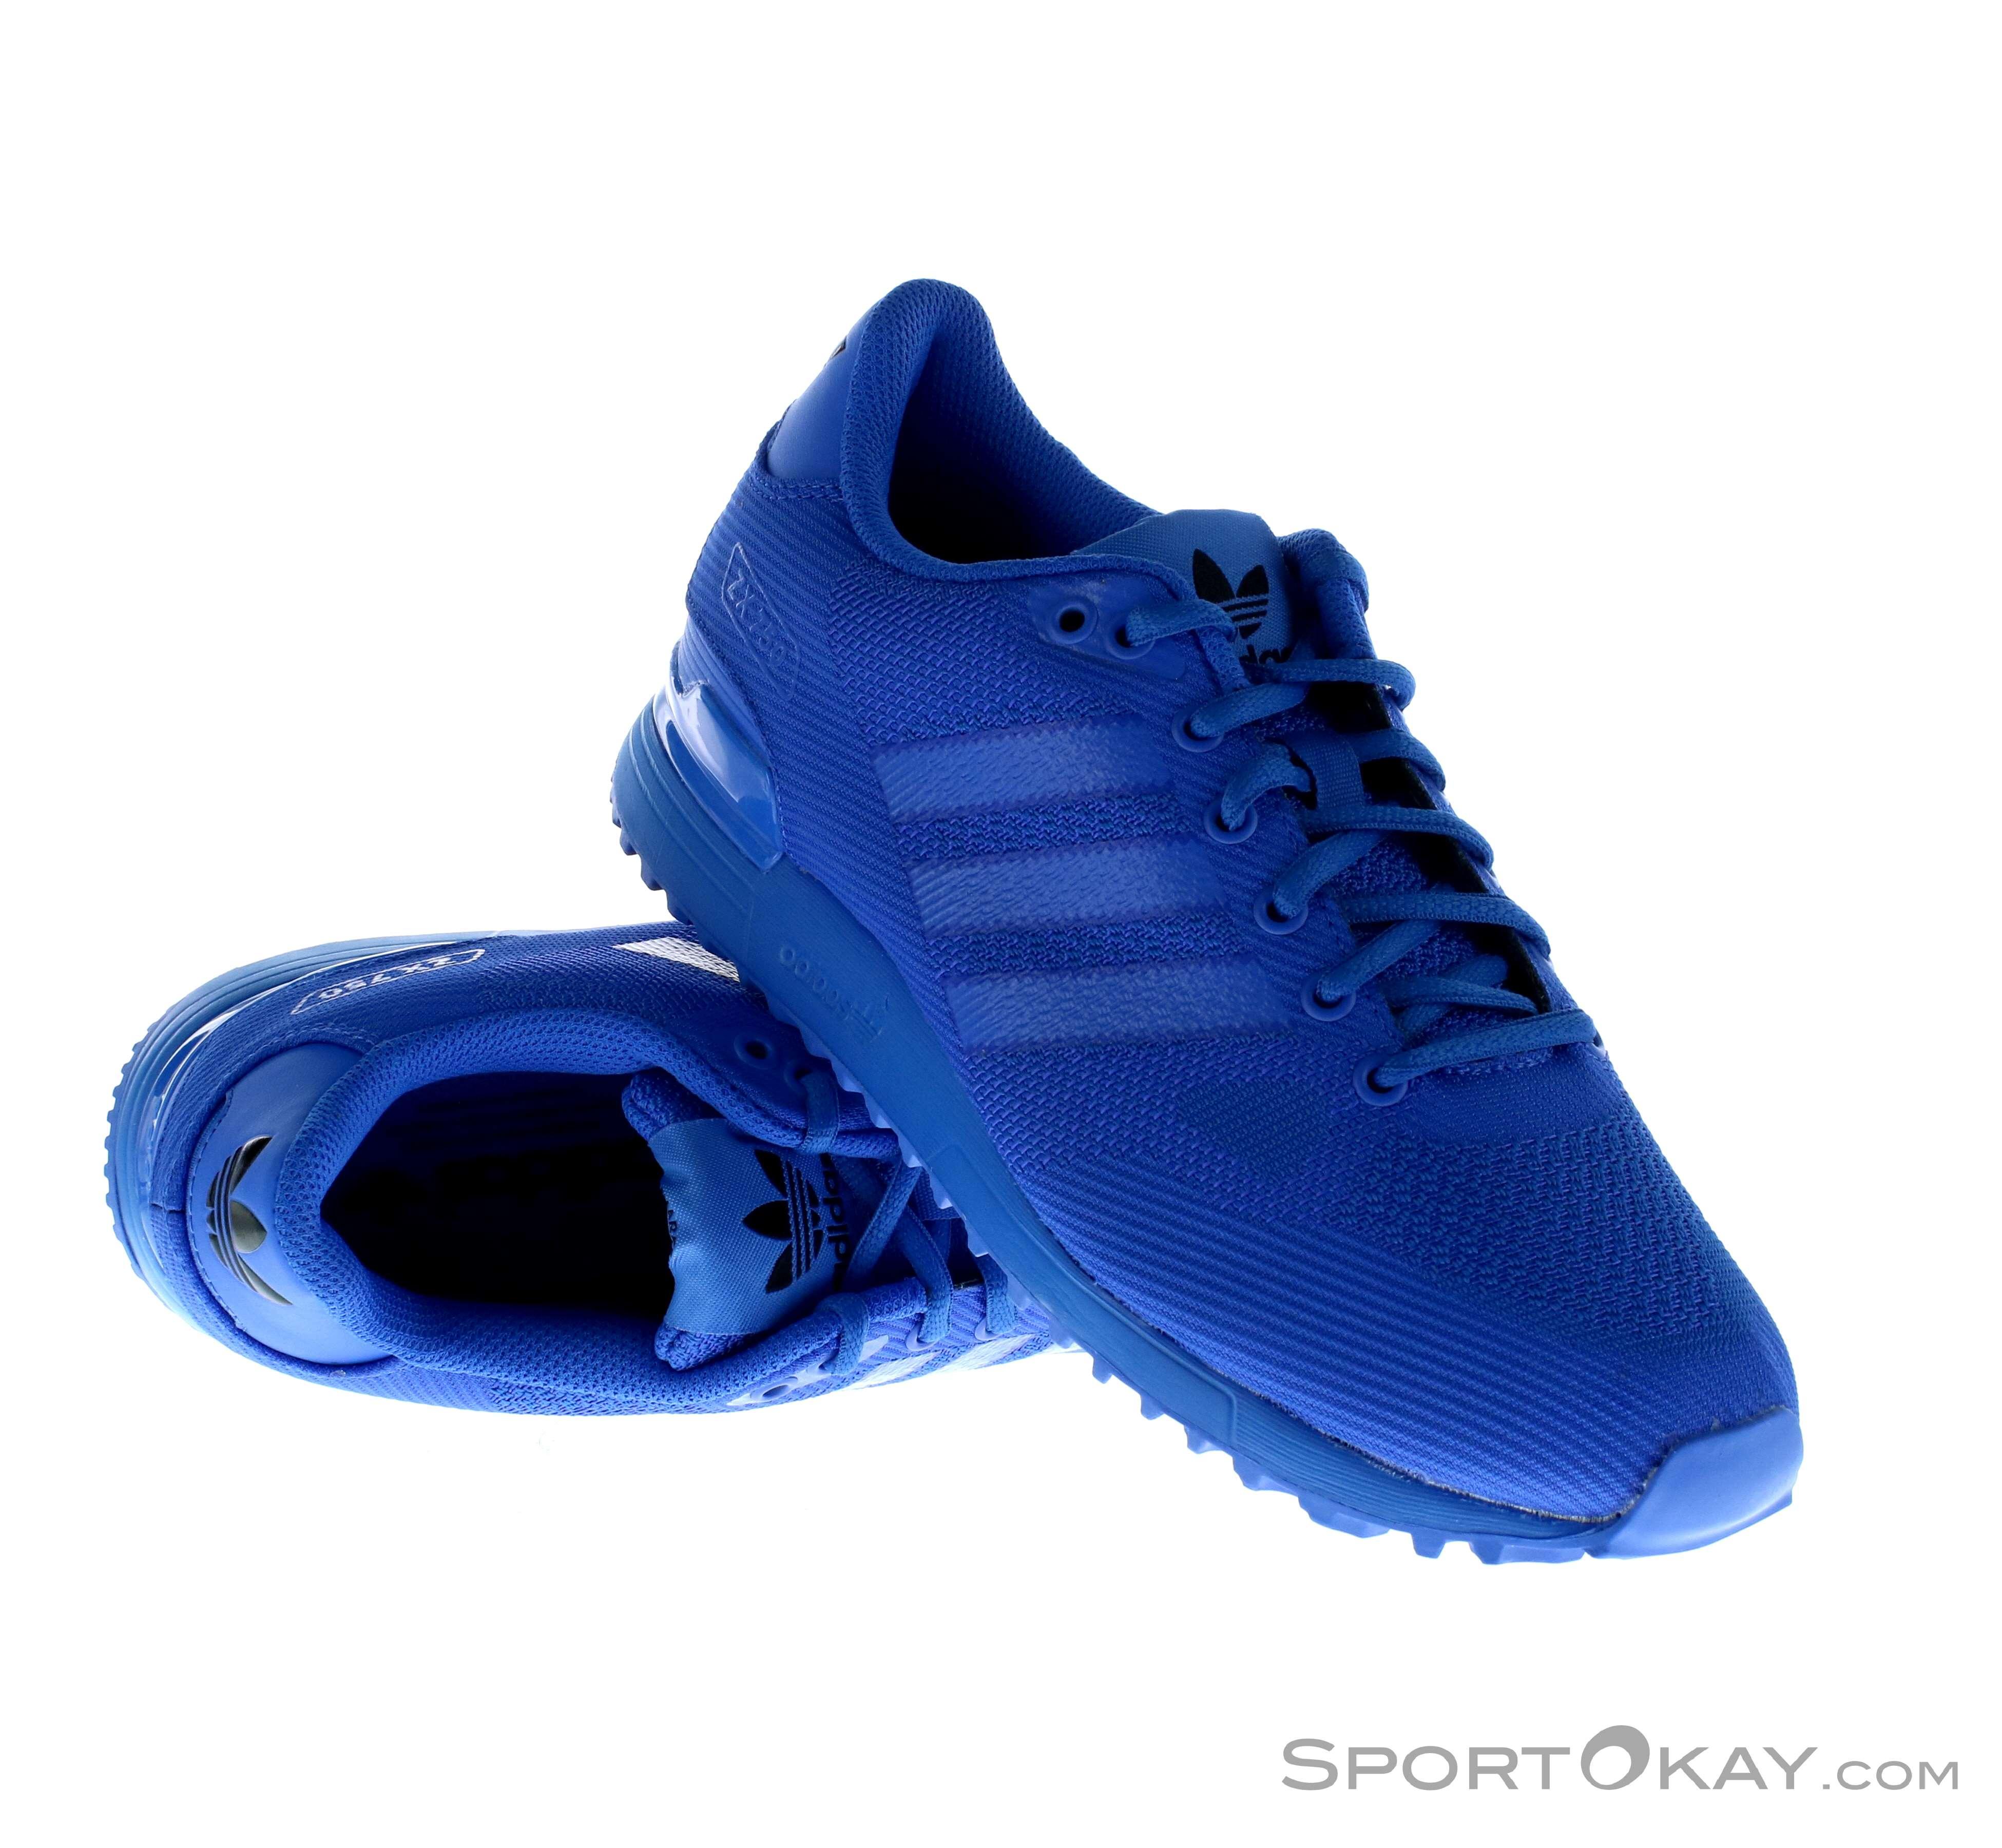 zx 750 adidas blu